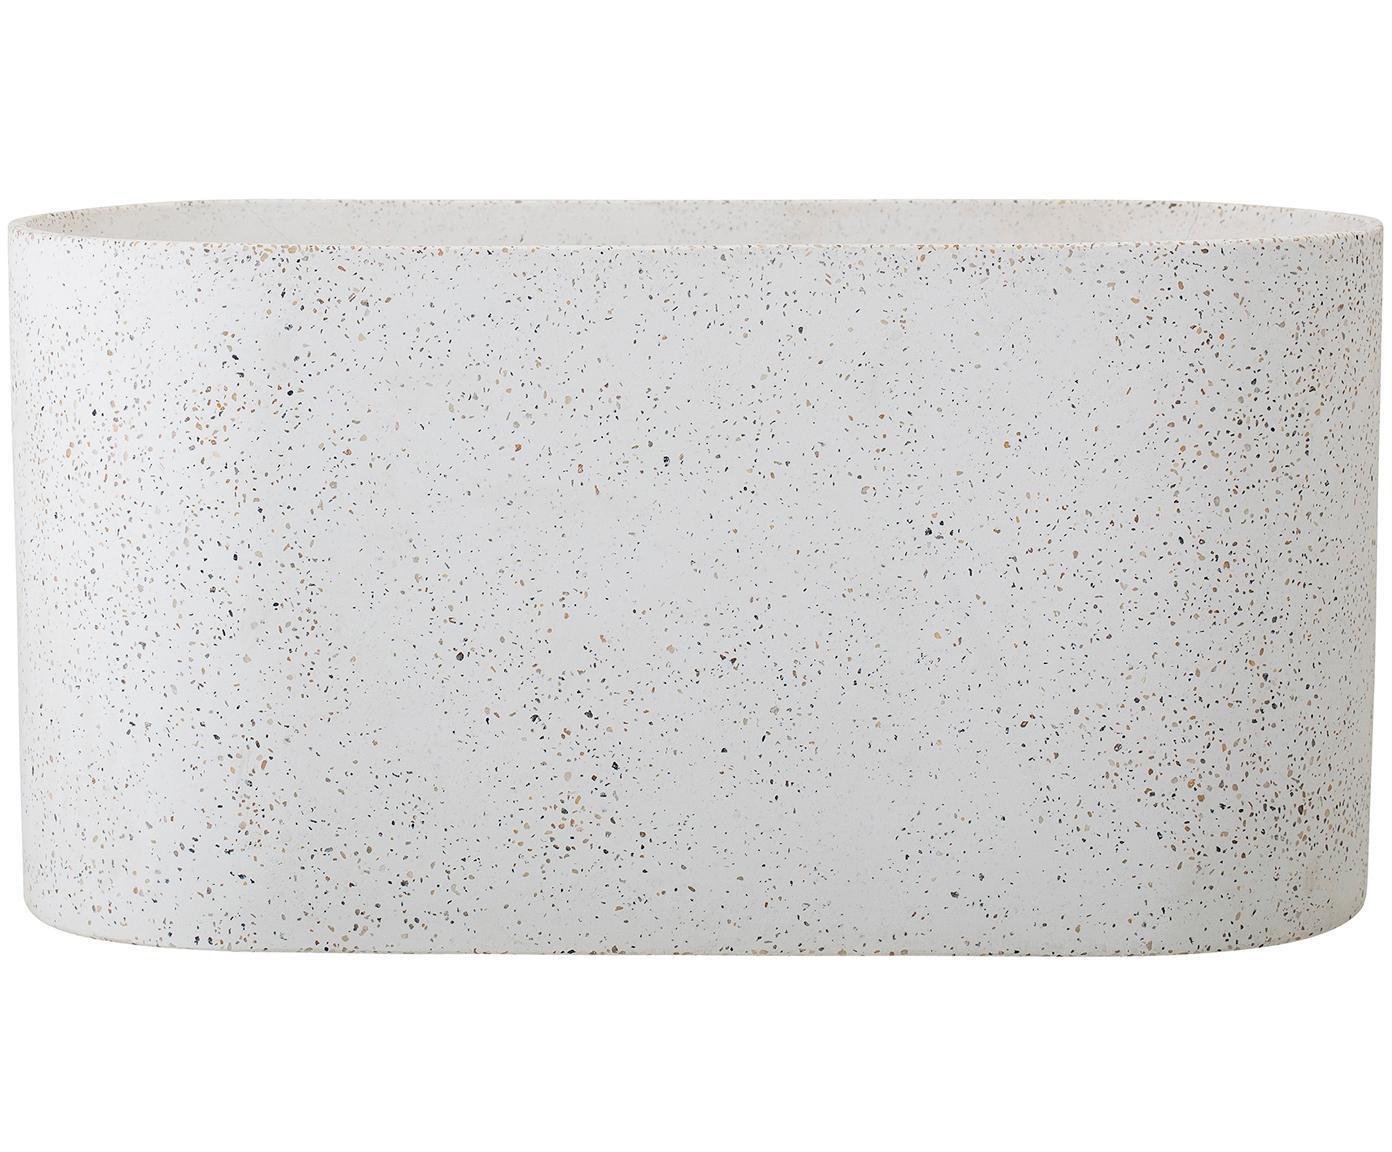 Übertopf Liam, Beton, Terrazzo, Weiß, Brauntönen, 40 x 20 cm